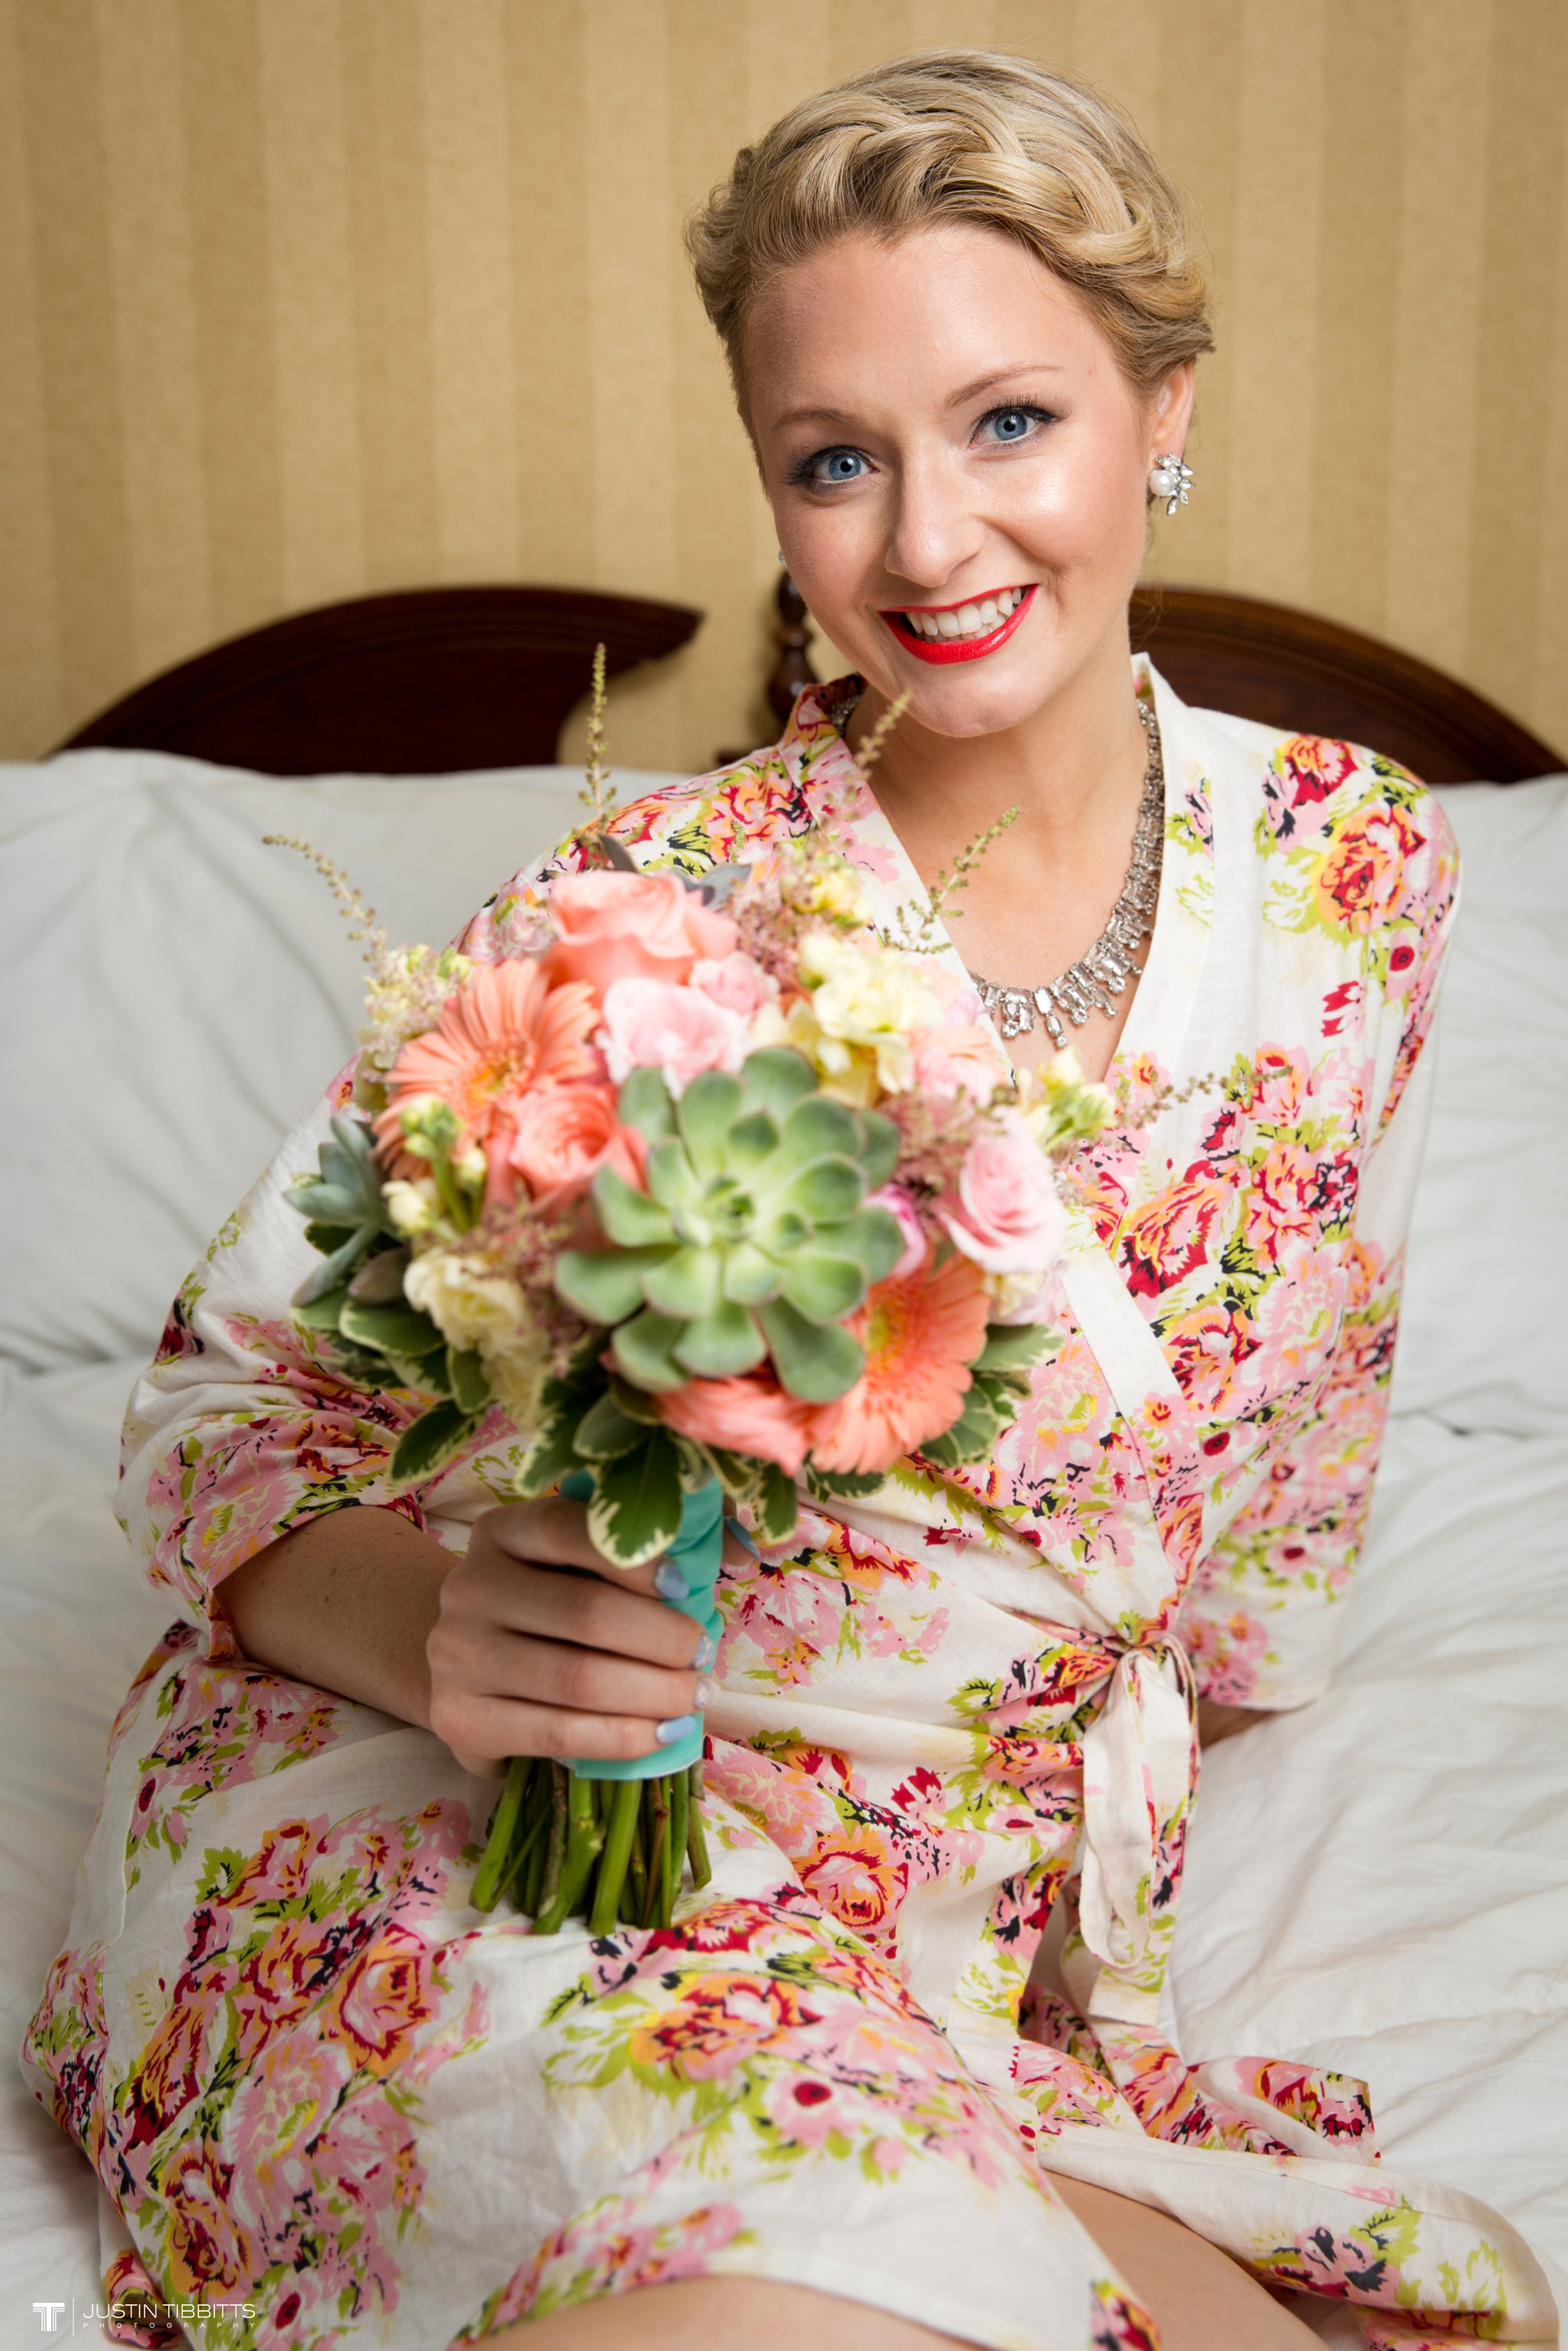 burlap-and-beams-wedding-photos-with-joran-and-molly_0016